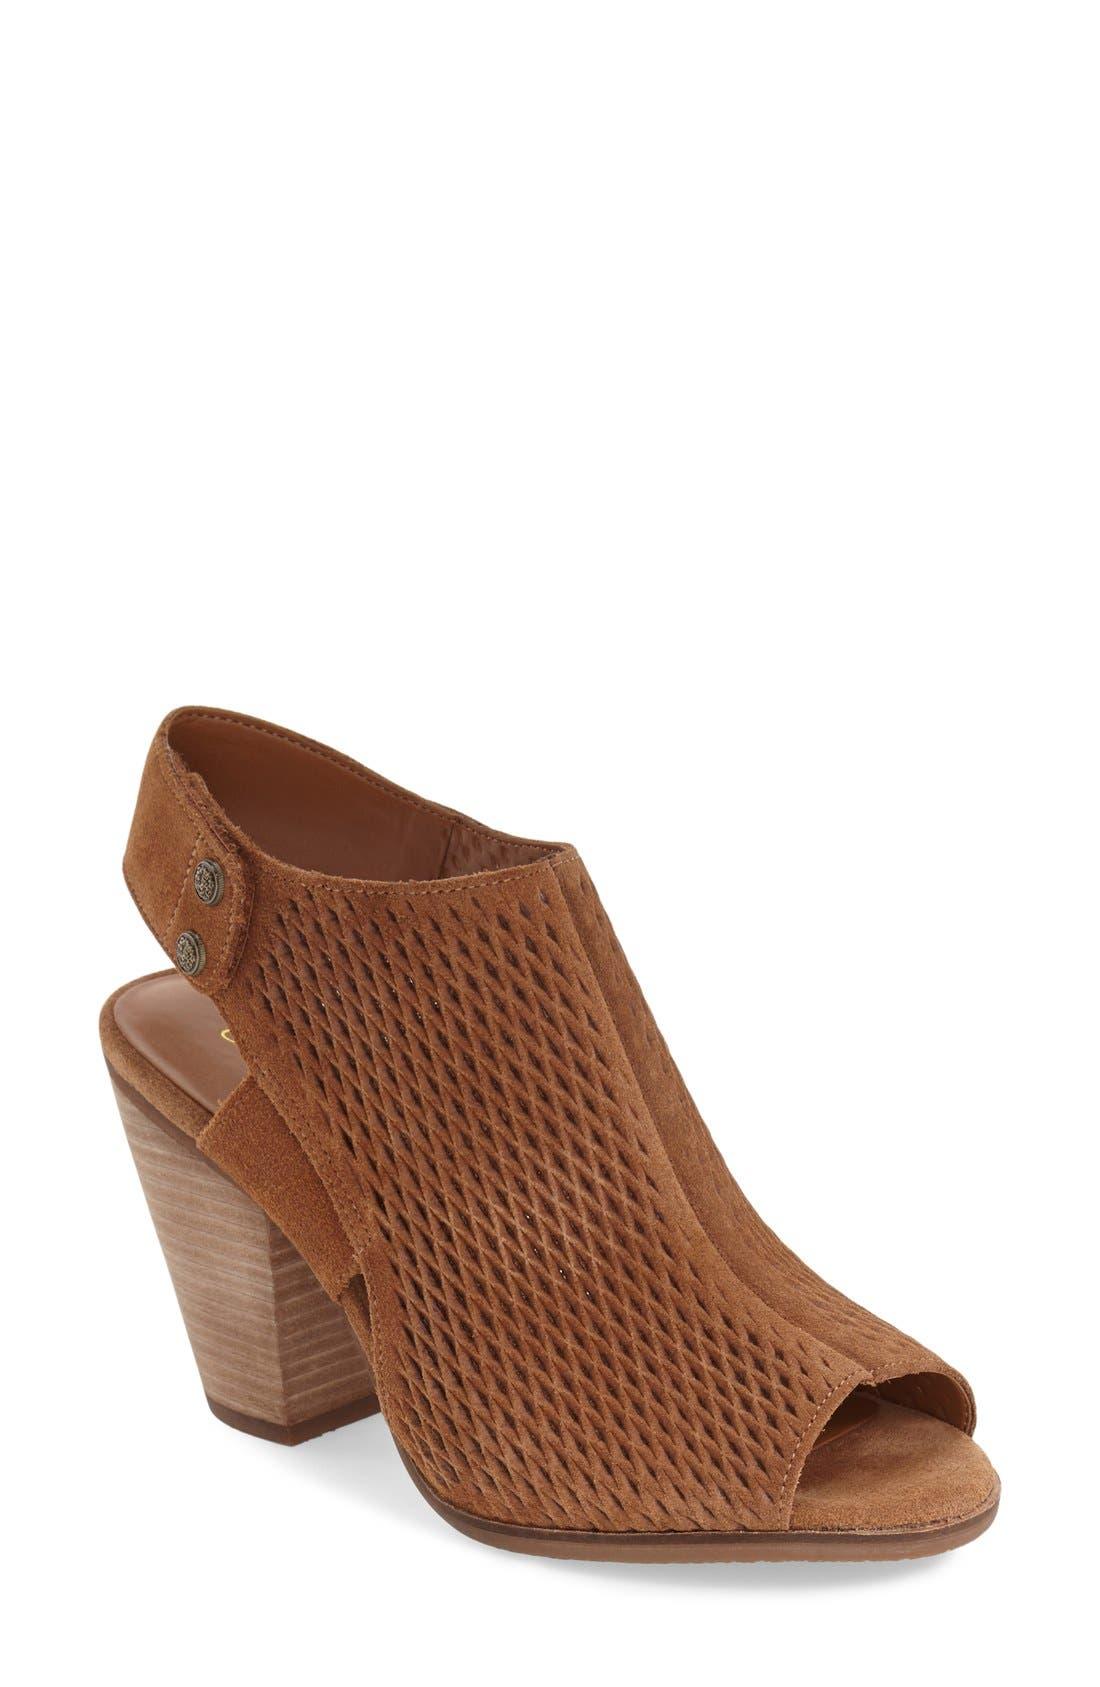 'Janel' Perforated Slingback Sandal,                         Main,                         color, 201